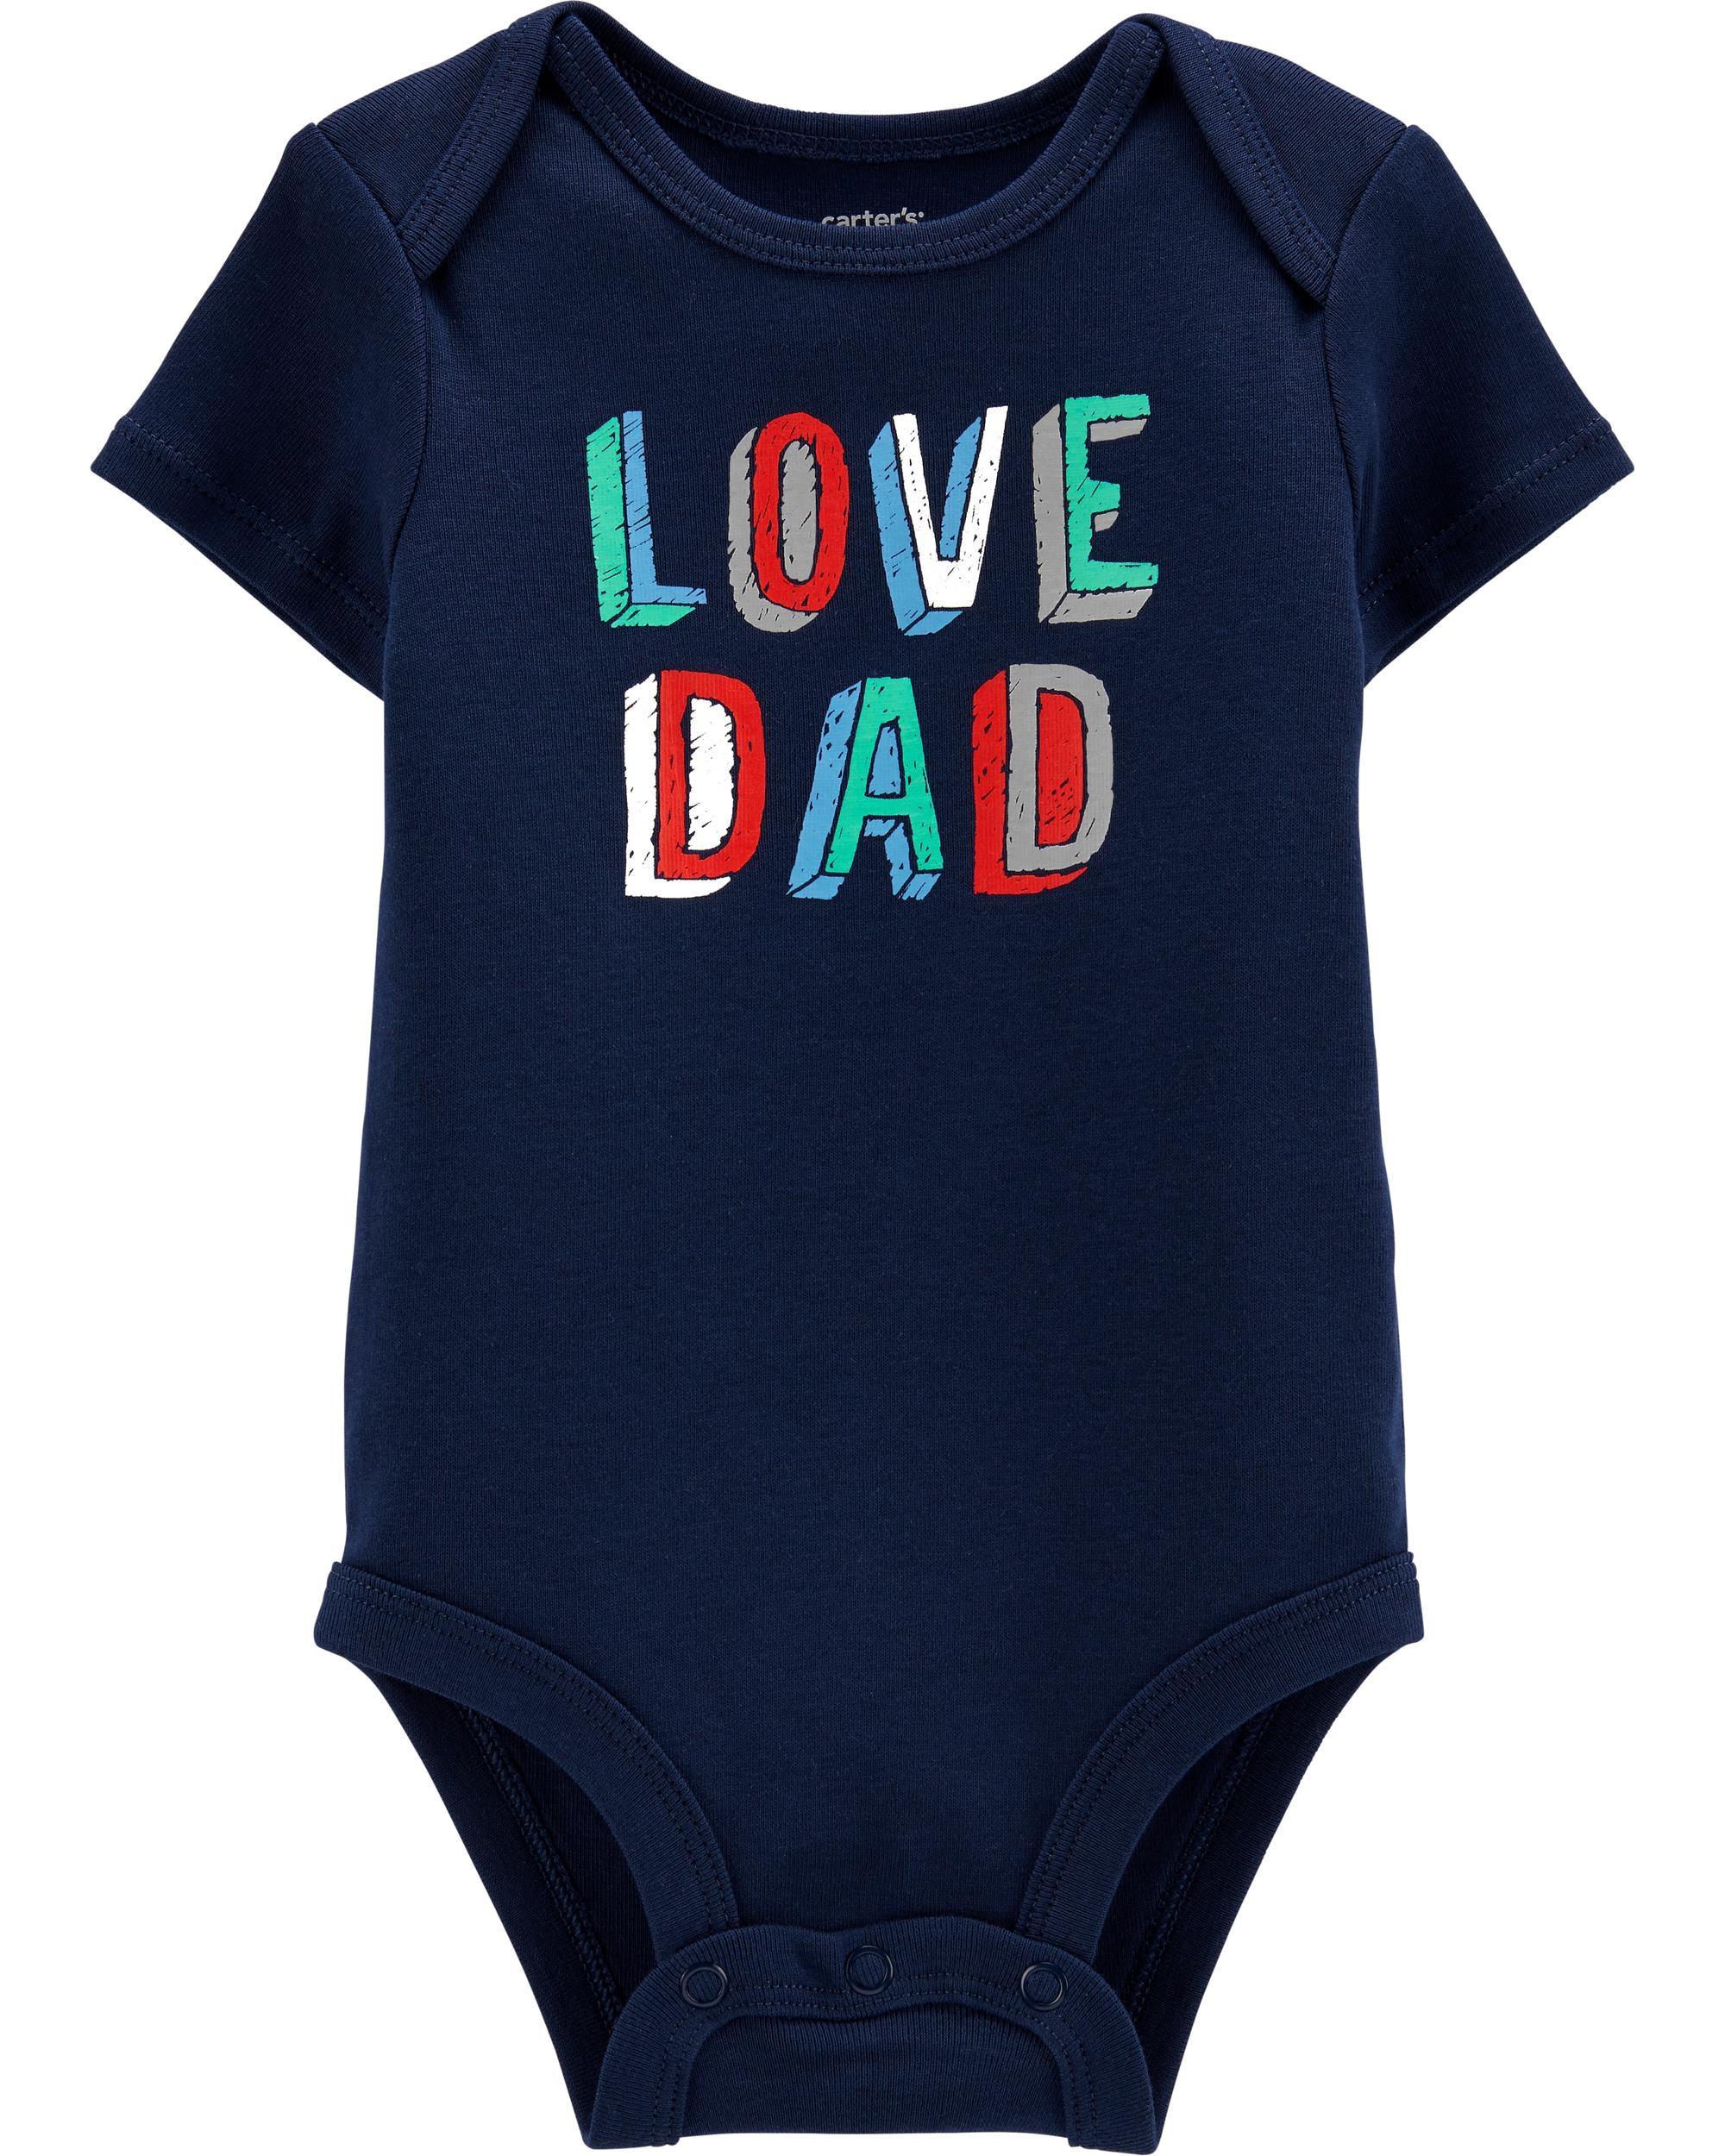 Carter's Body Love Dad imagine